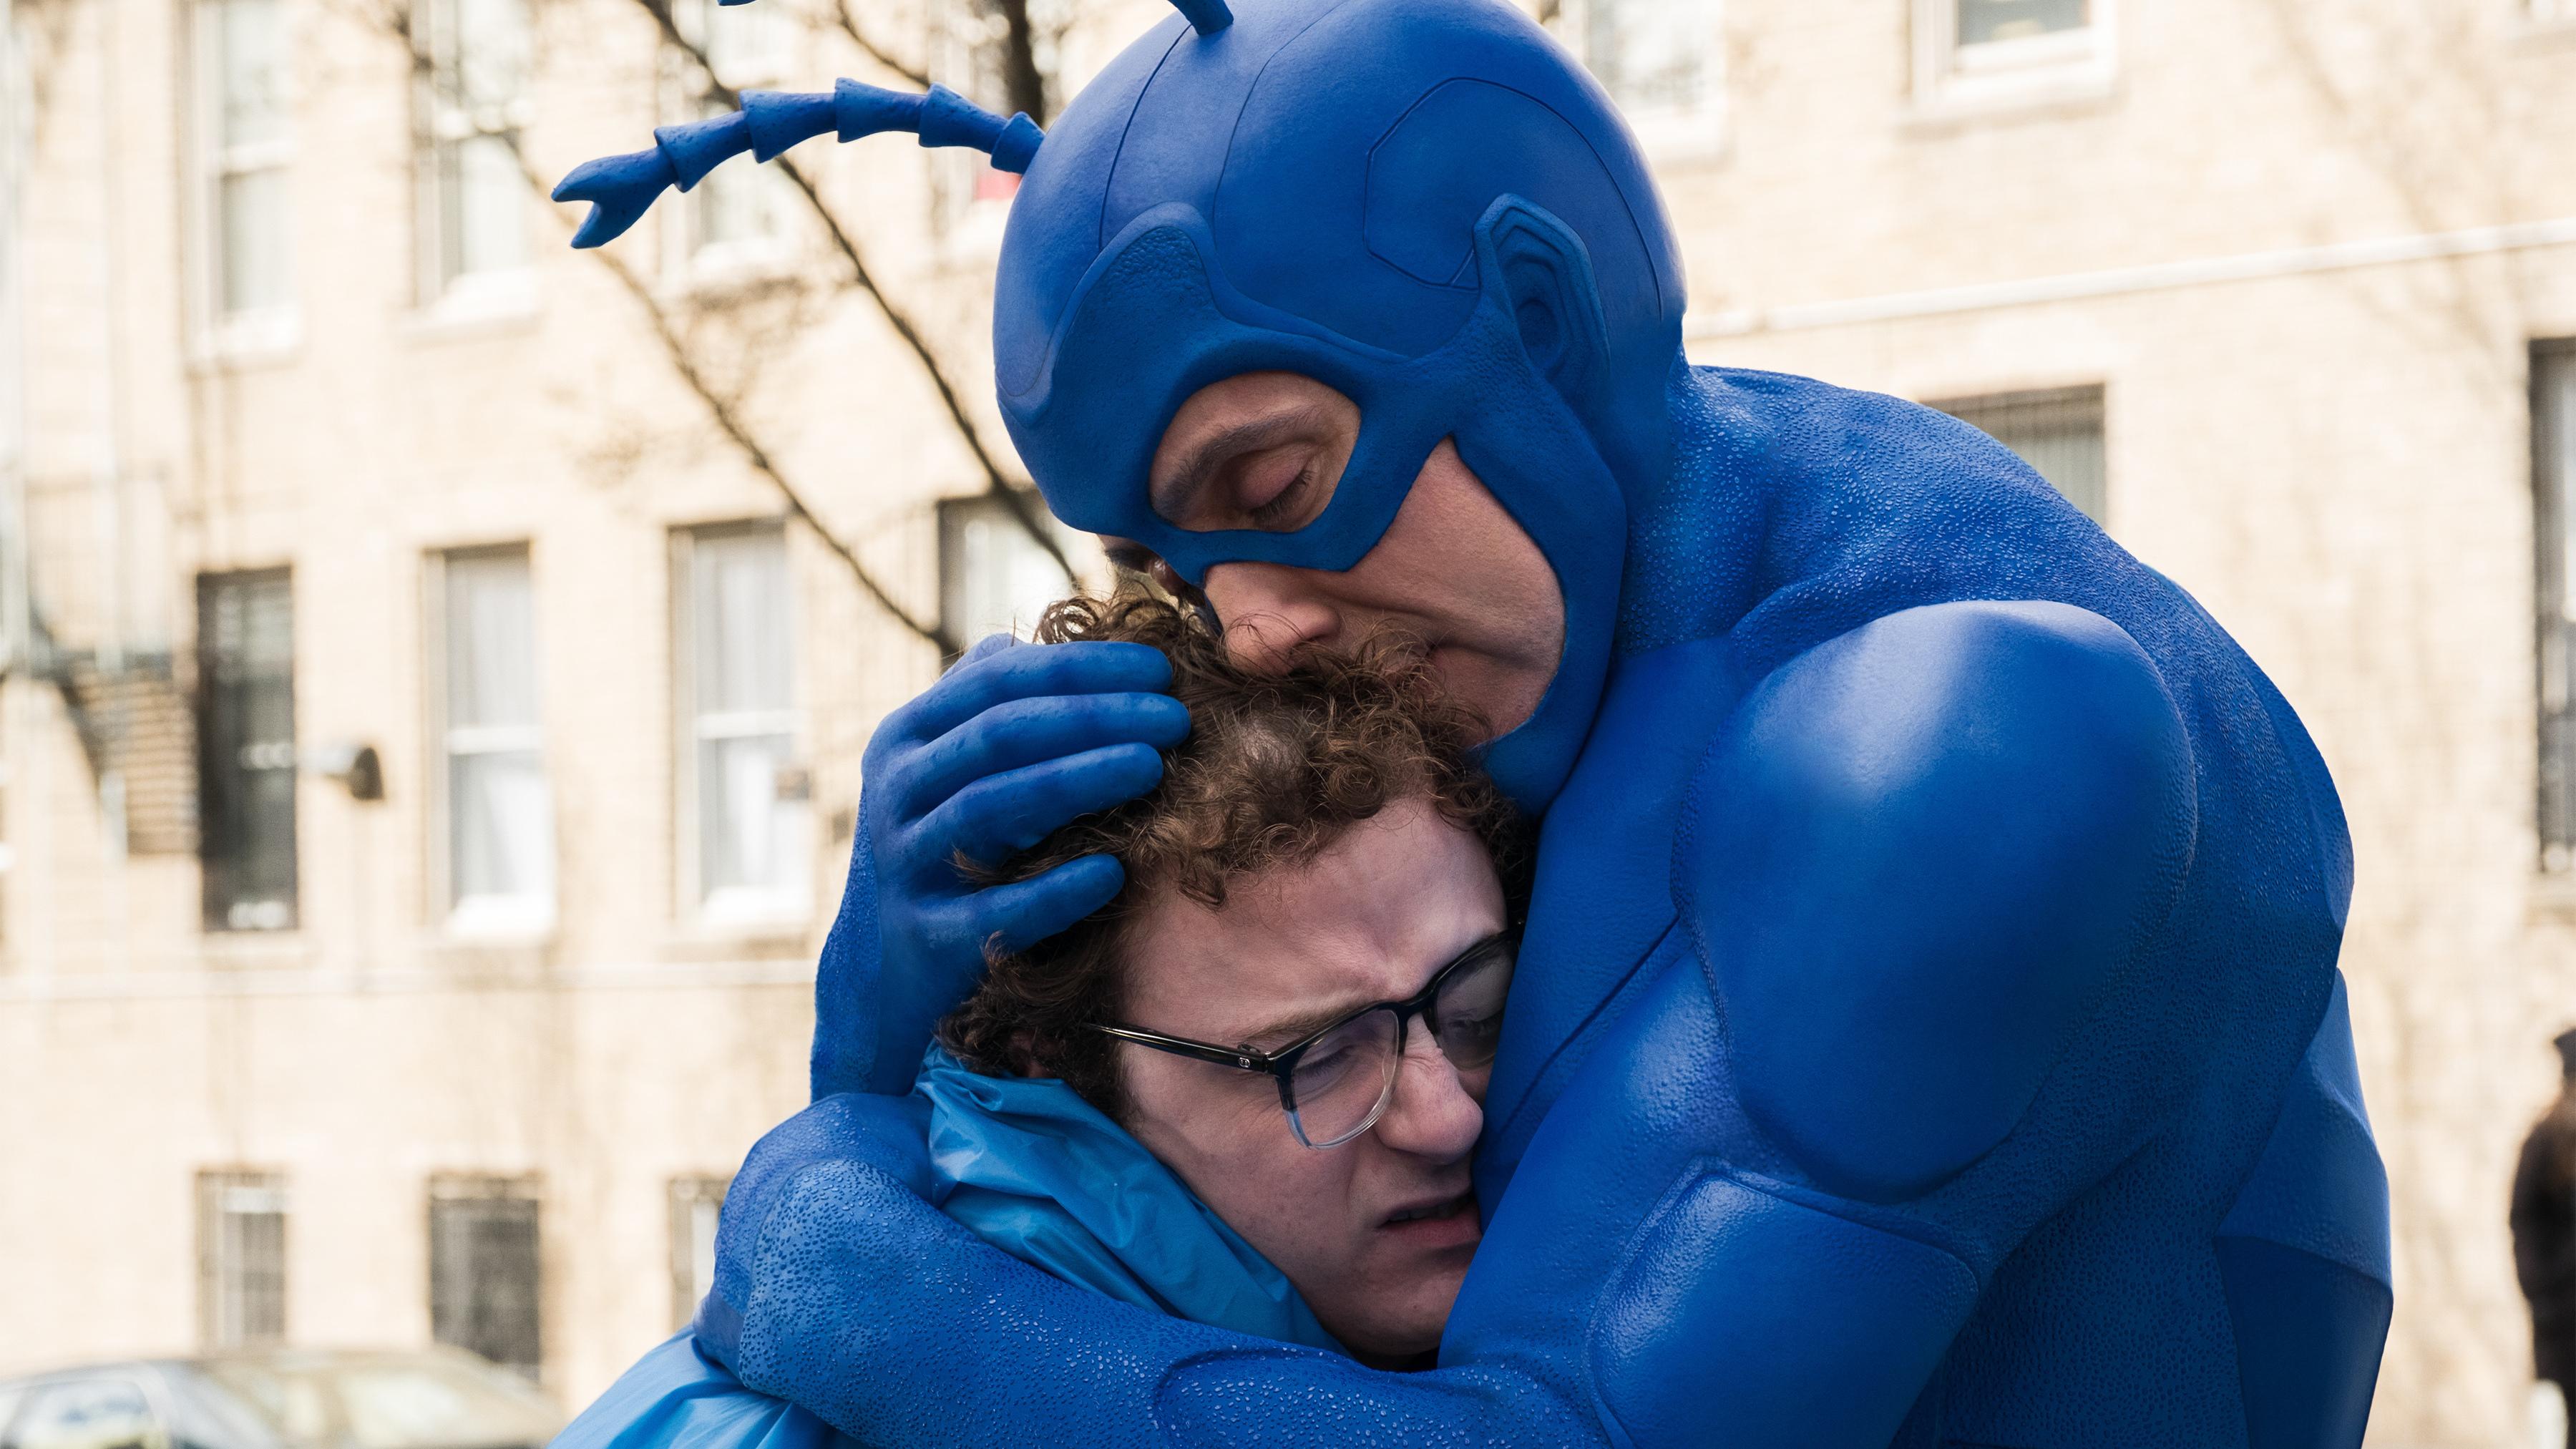 He's Big, He's Blue, And Now, He's Bingeable: 'The Tick' Returns